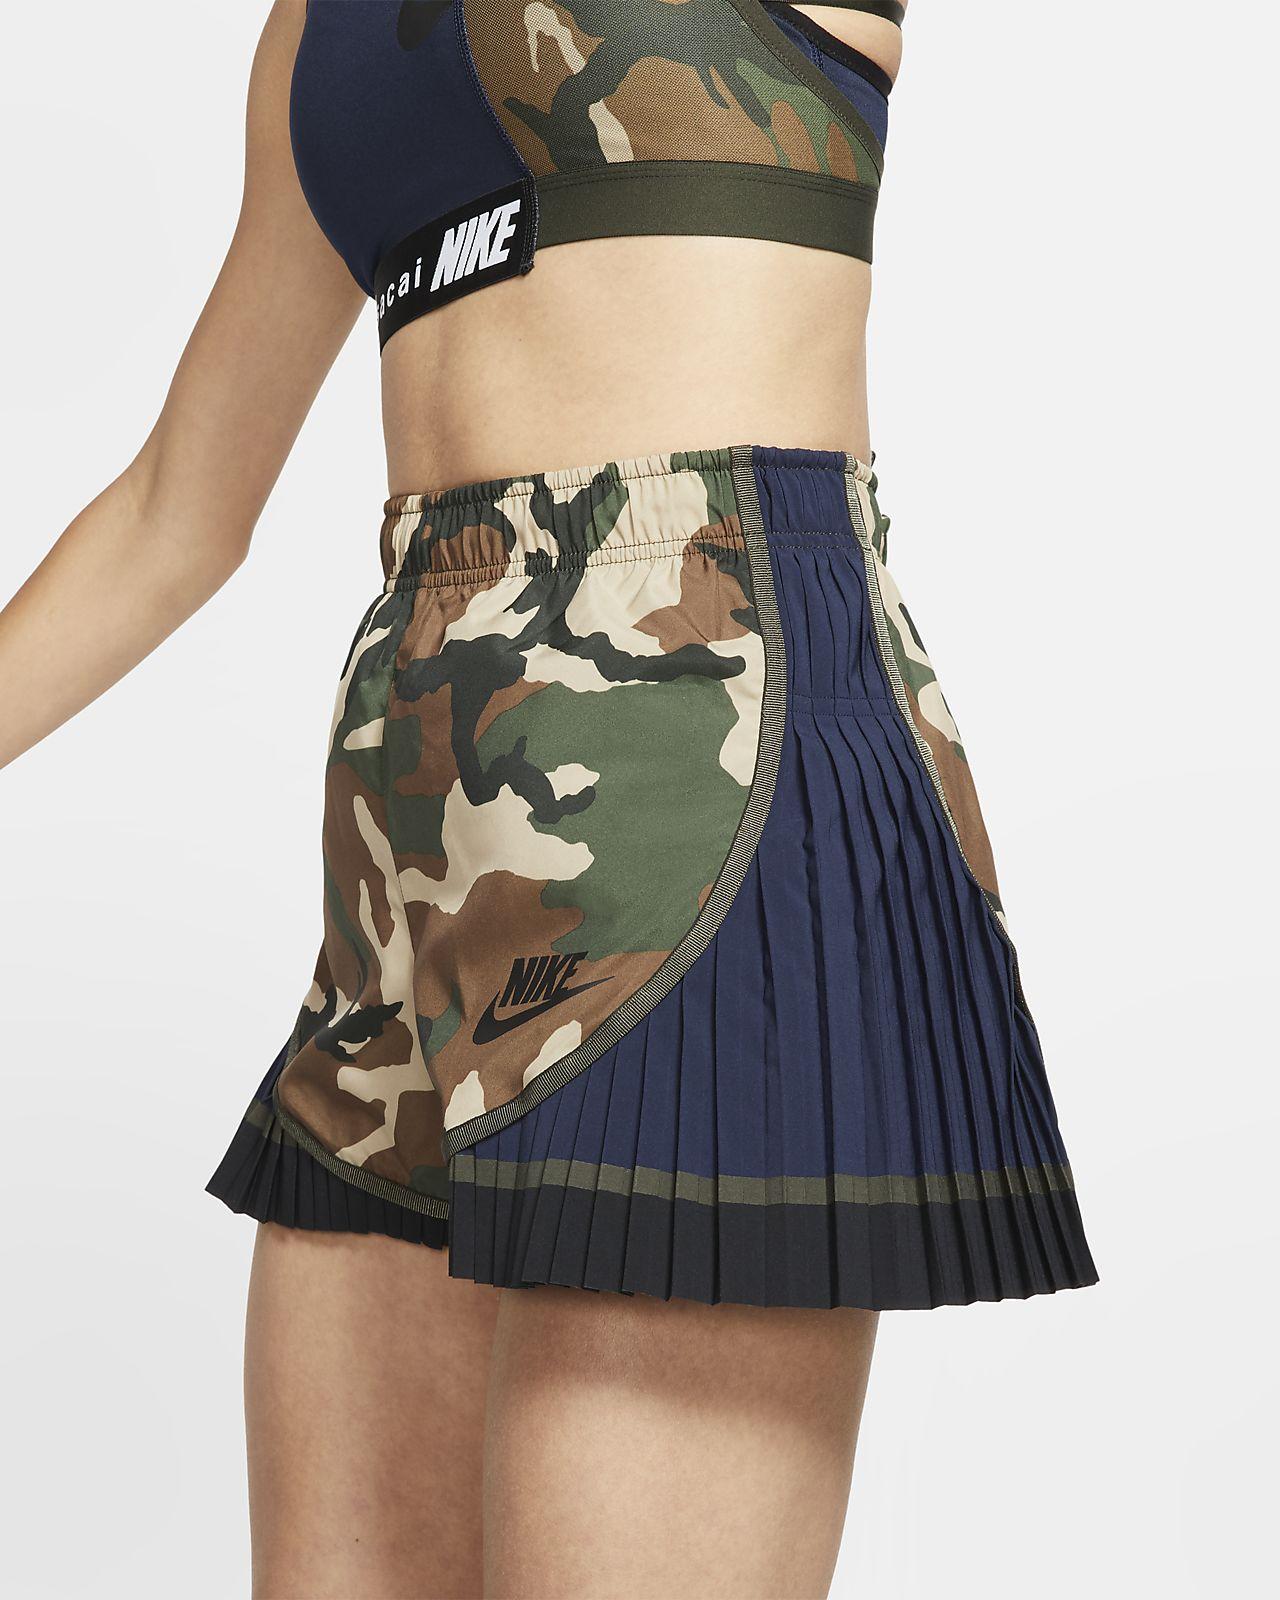 Nike mit Tempo Shorts Camomuster x Sacai Damen Faltendesign für im hxdCtsQr